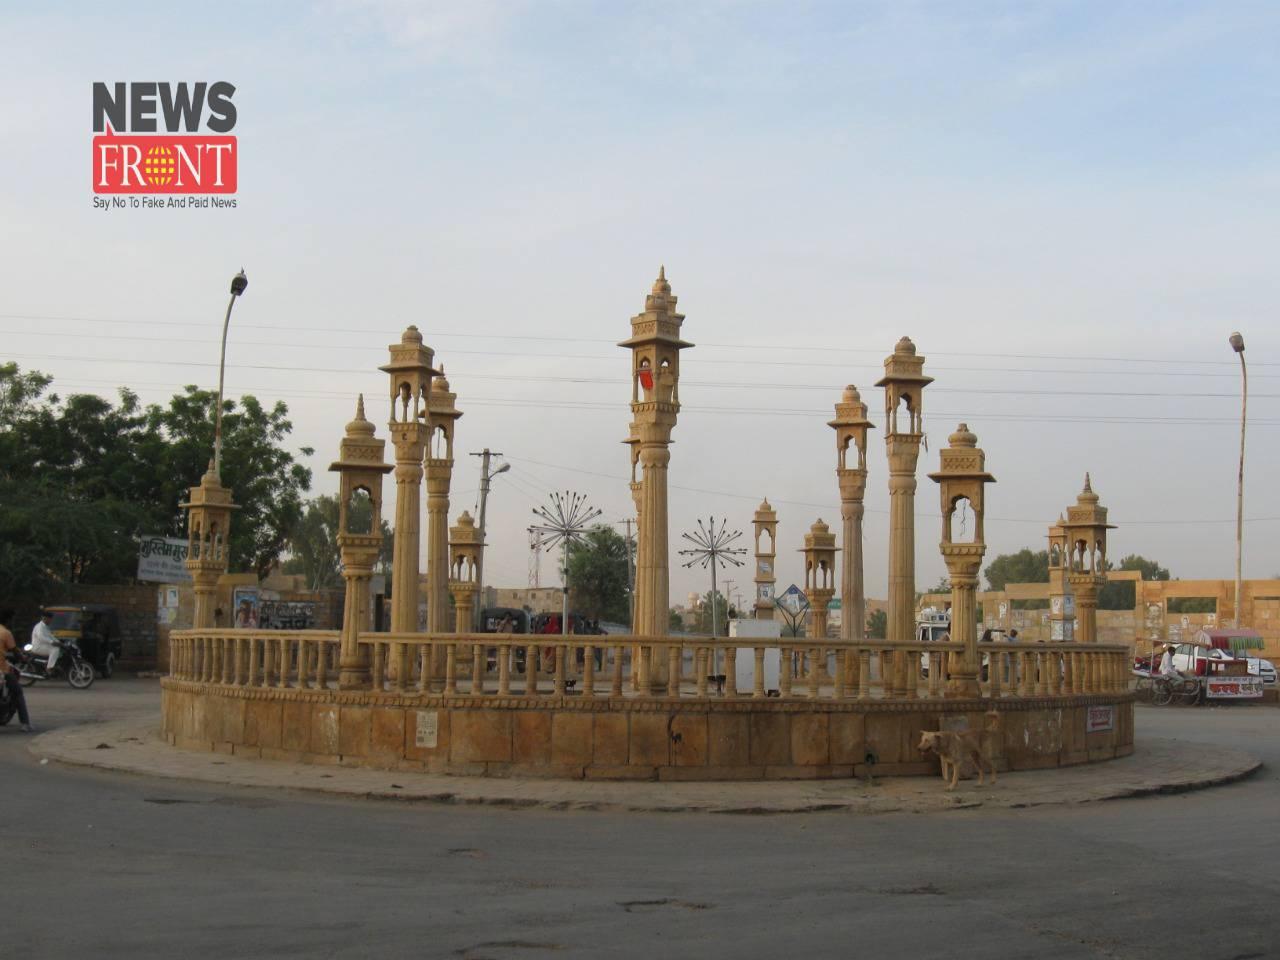 Mahal | newsfront.co